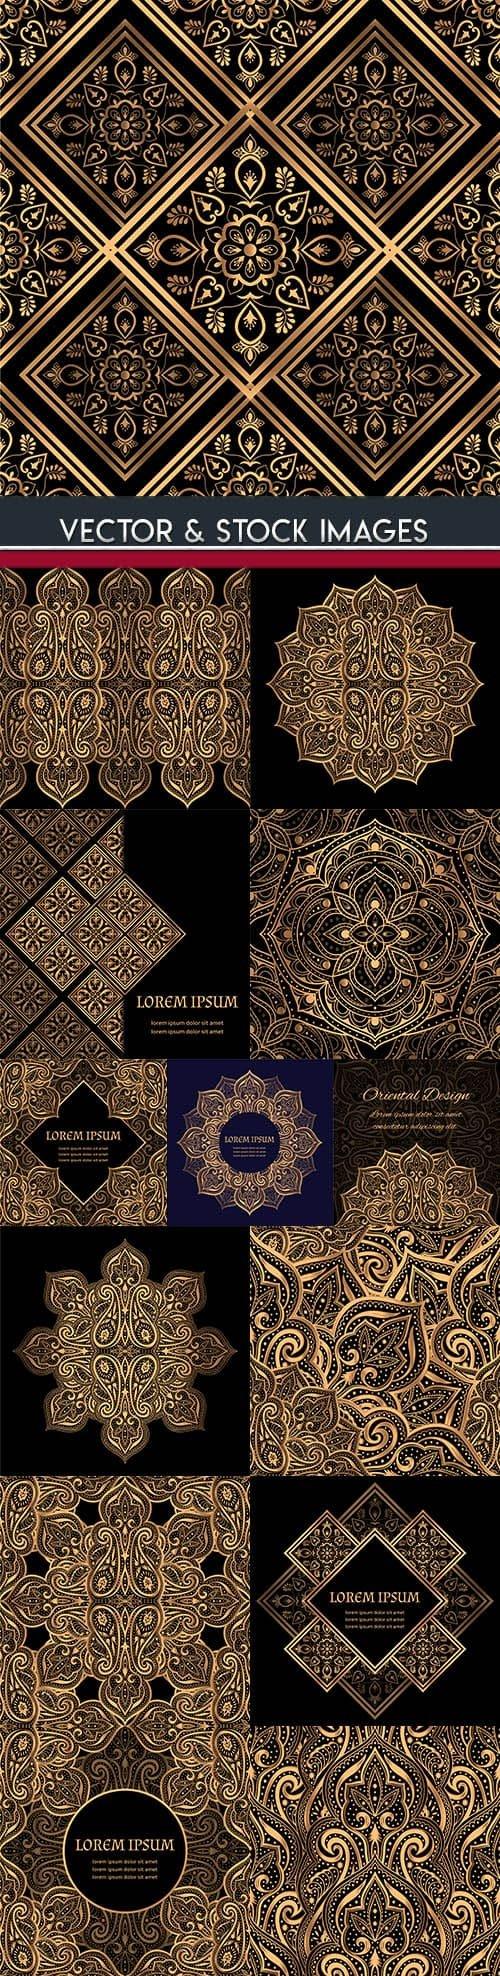 Decorative pattern and mandala gold design